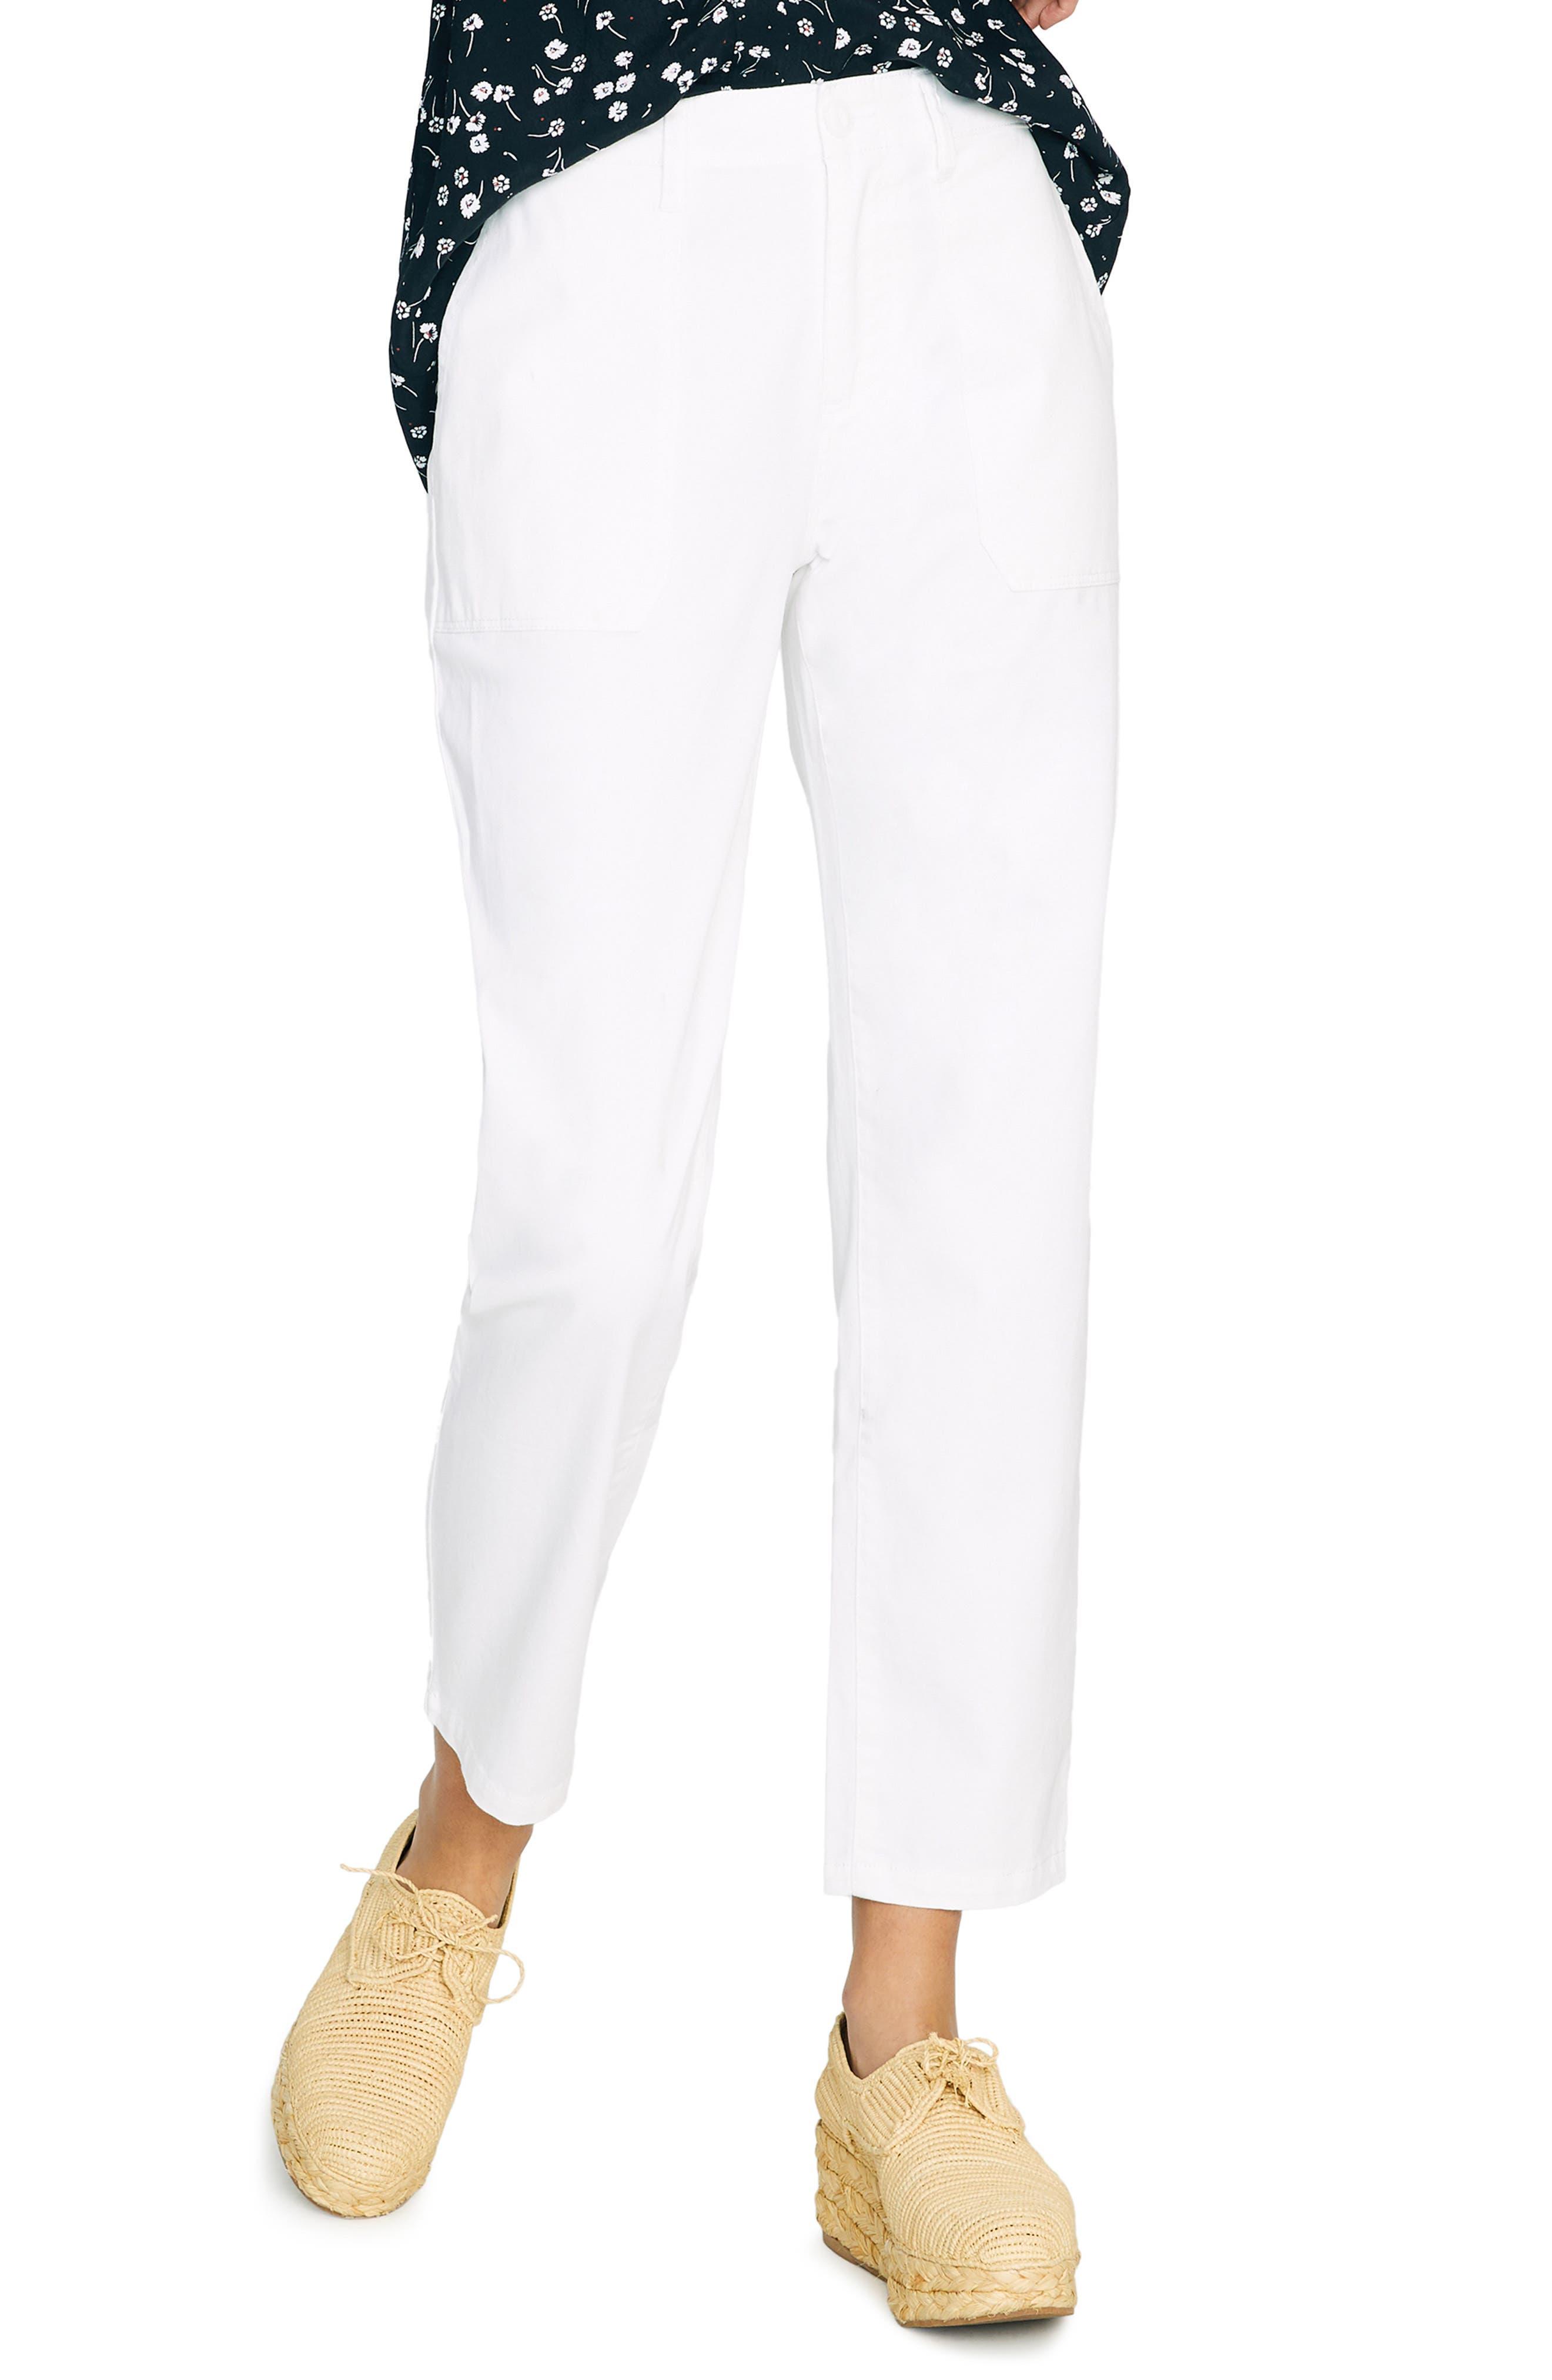 8a42b878a780f7 Women's Chino & Khaki Clothing | Nordstrom